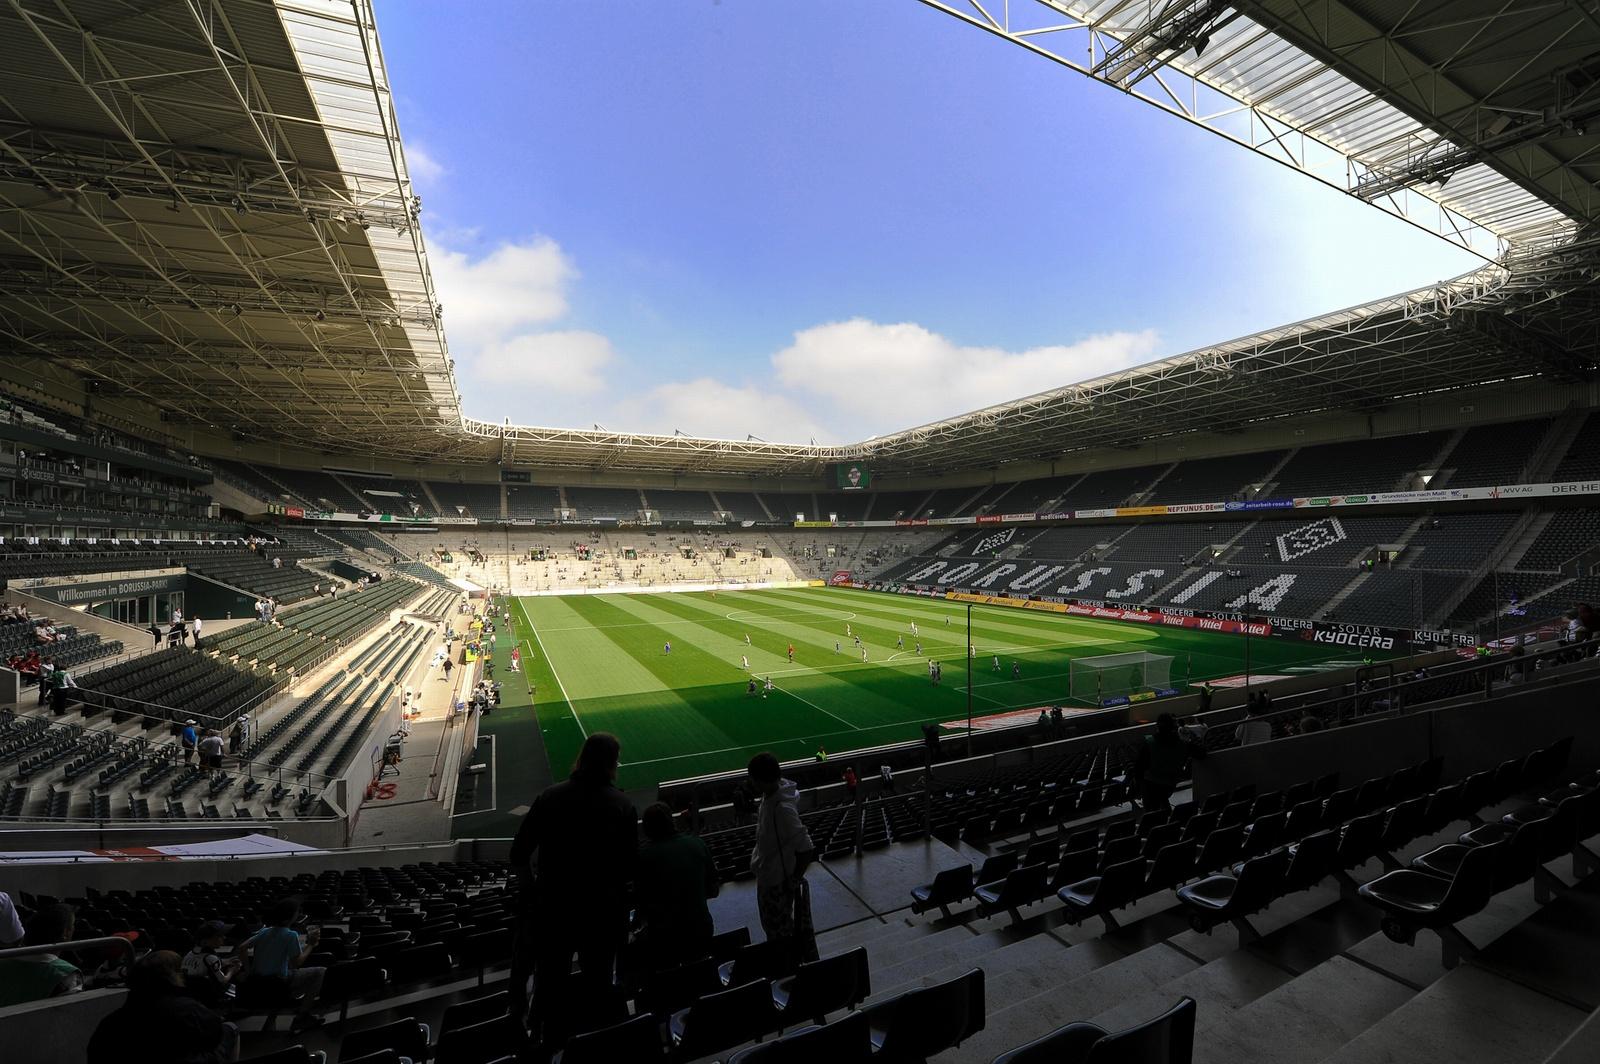 Боруссия менхенгладбах стадион тренировочная база